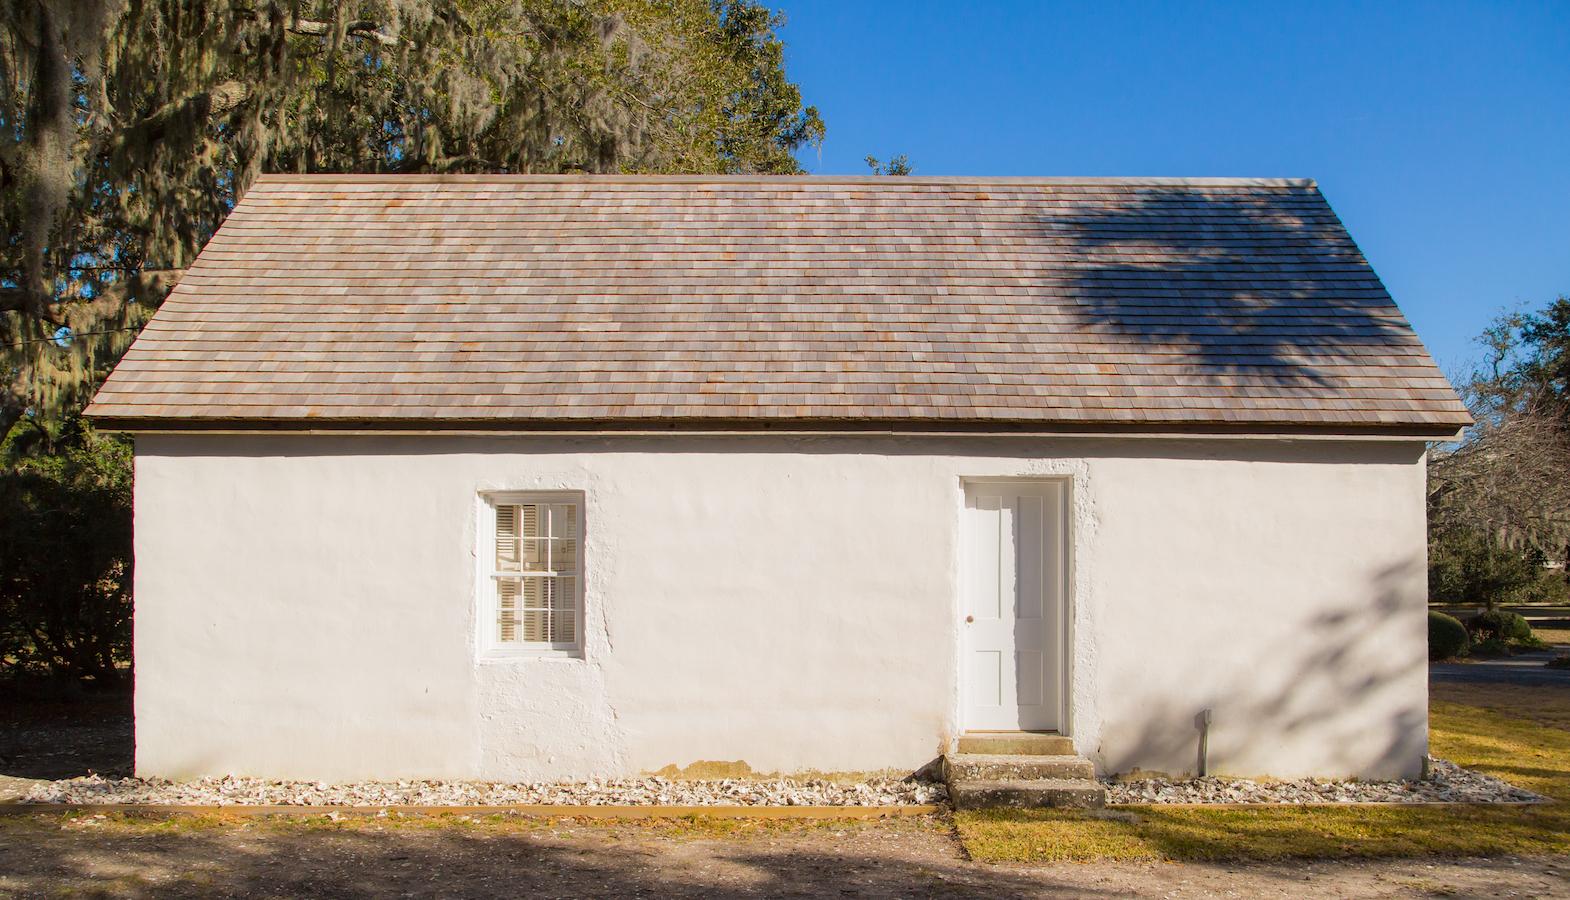 Landmark Preservation_Slave Cabins (8 of 52) copy 2.jpg